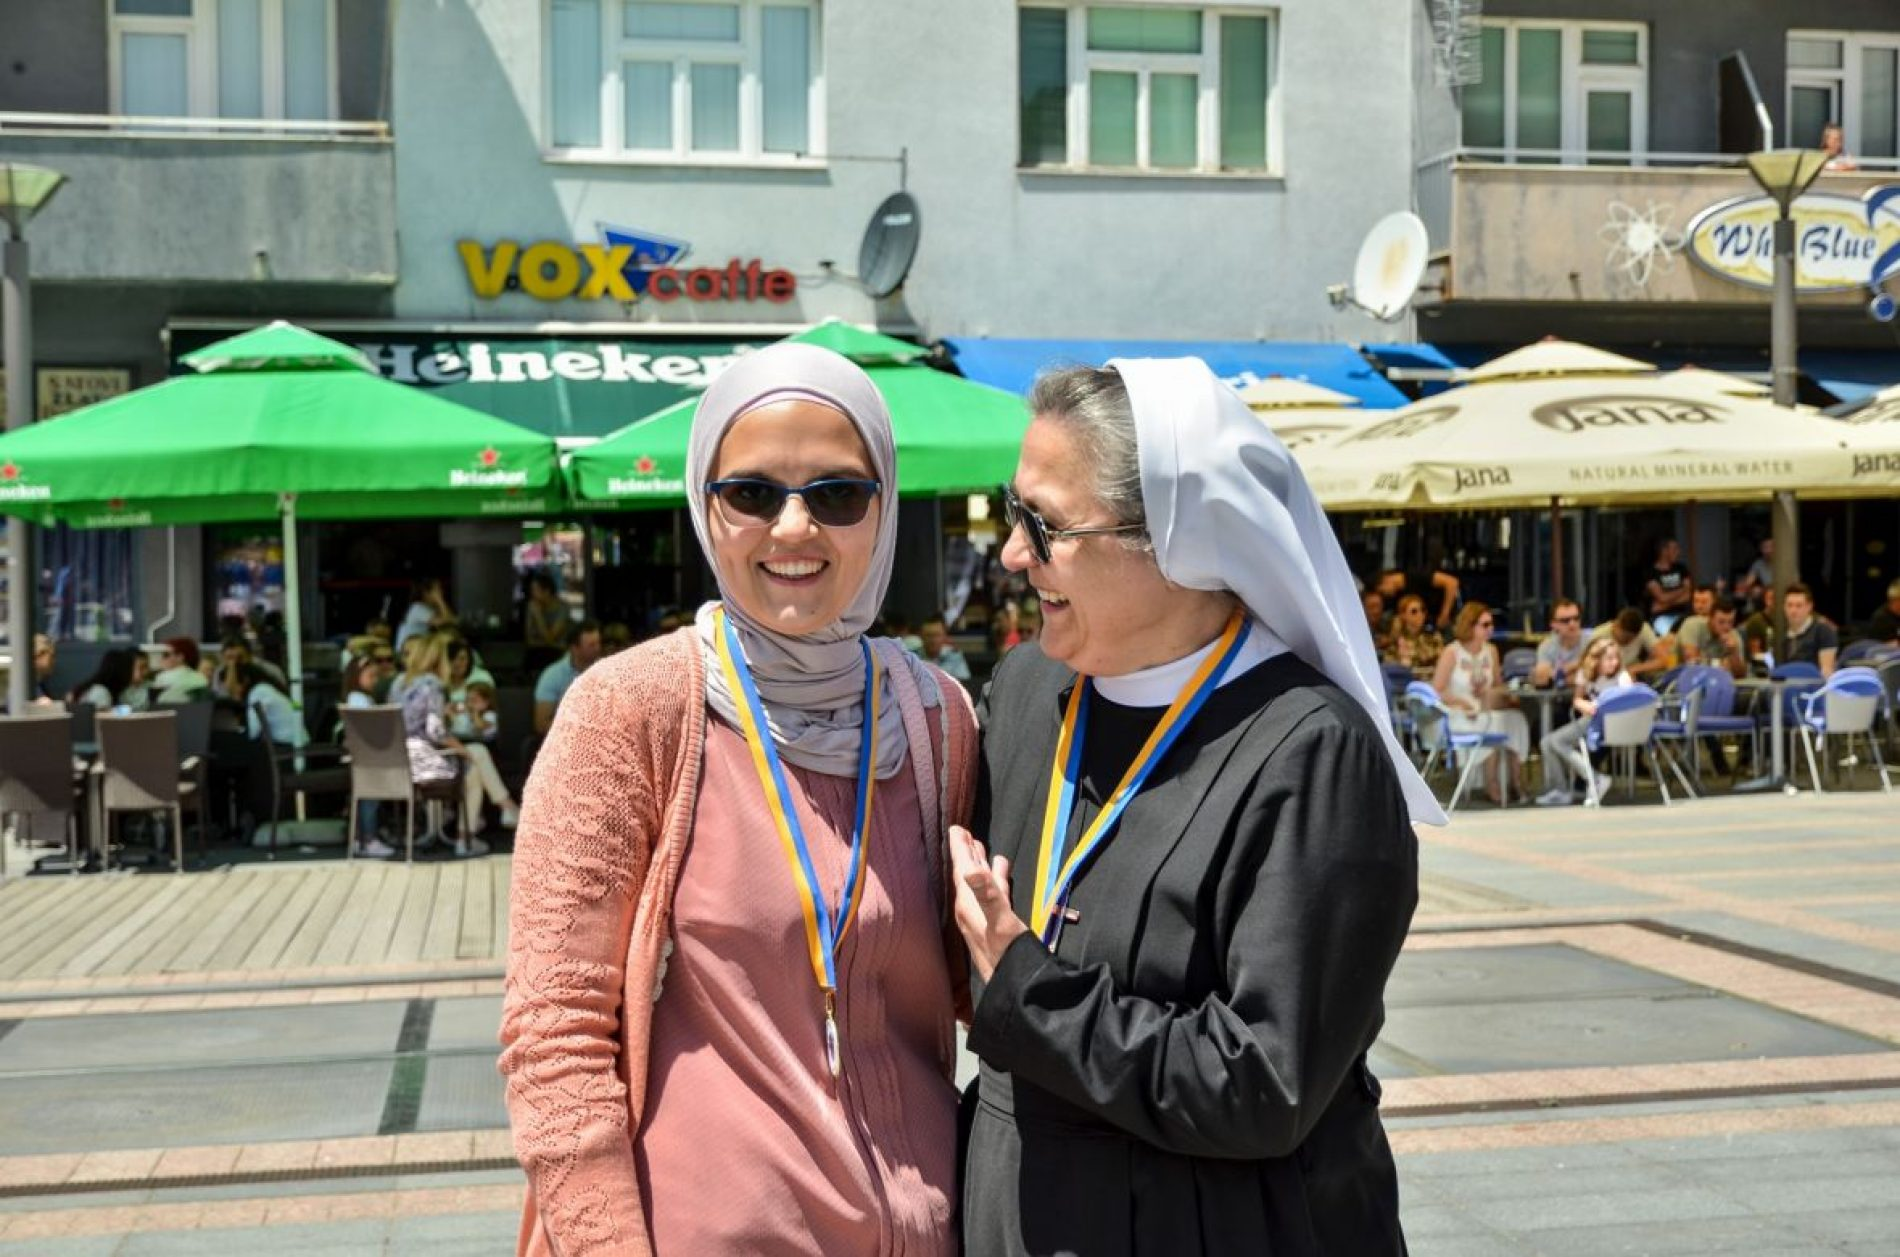 Časna sestra Blanka i mualima Šejla pomažu pravoslavnu porodicu s petero djece